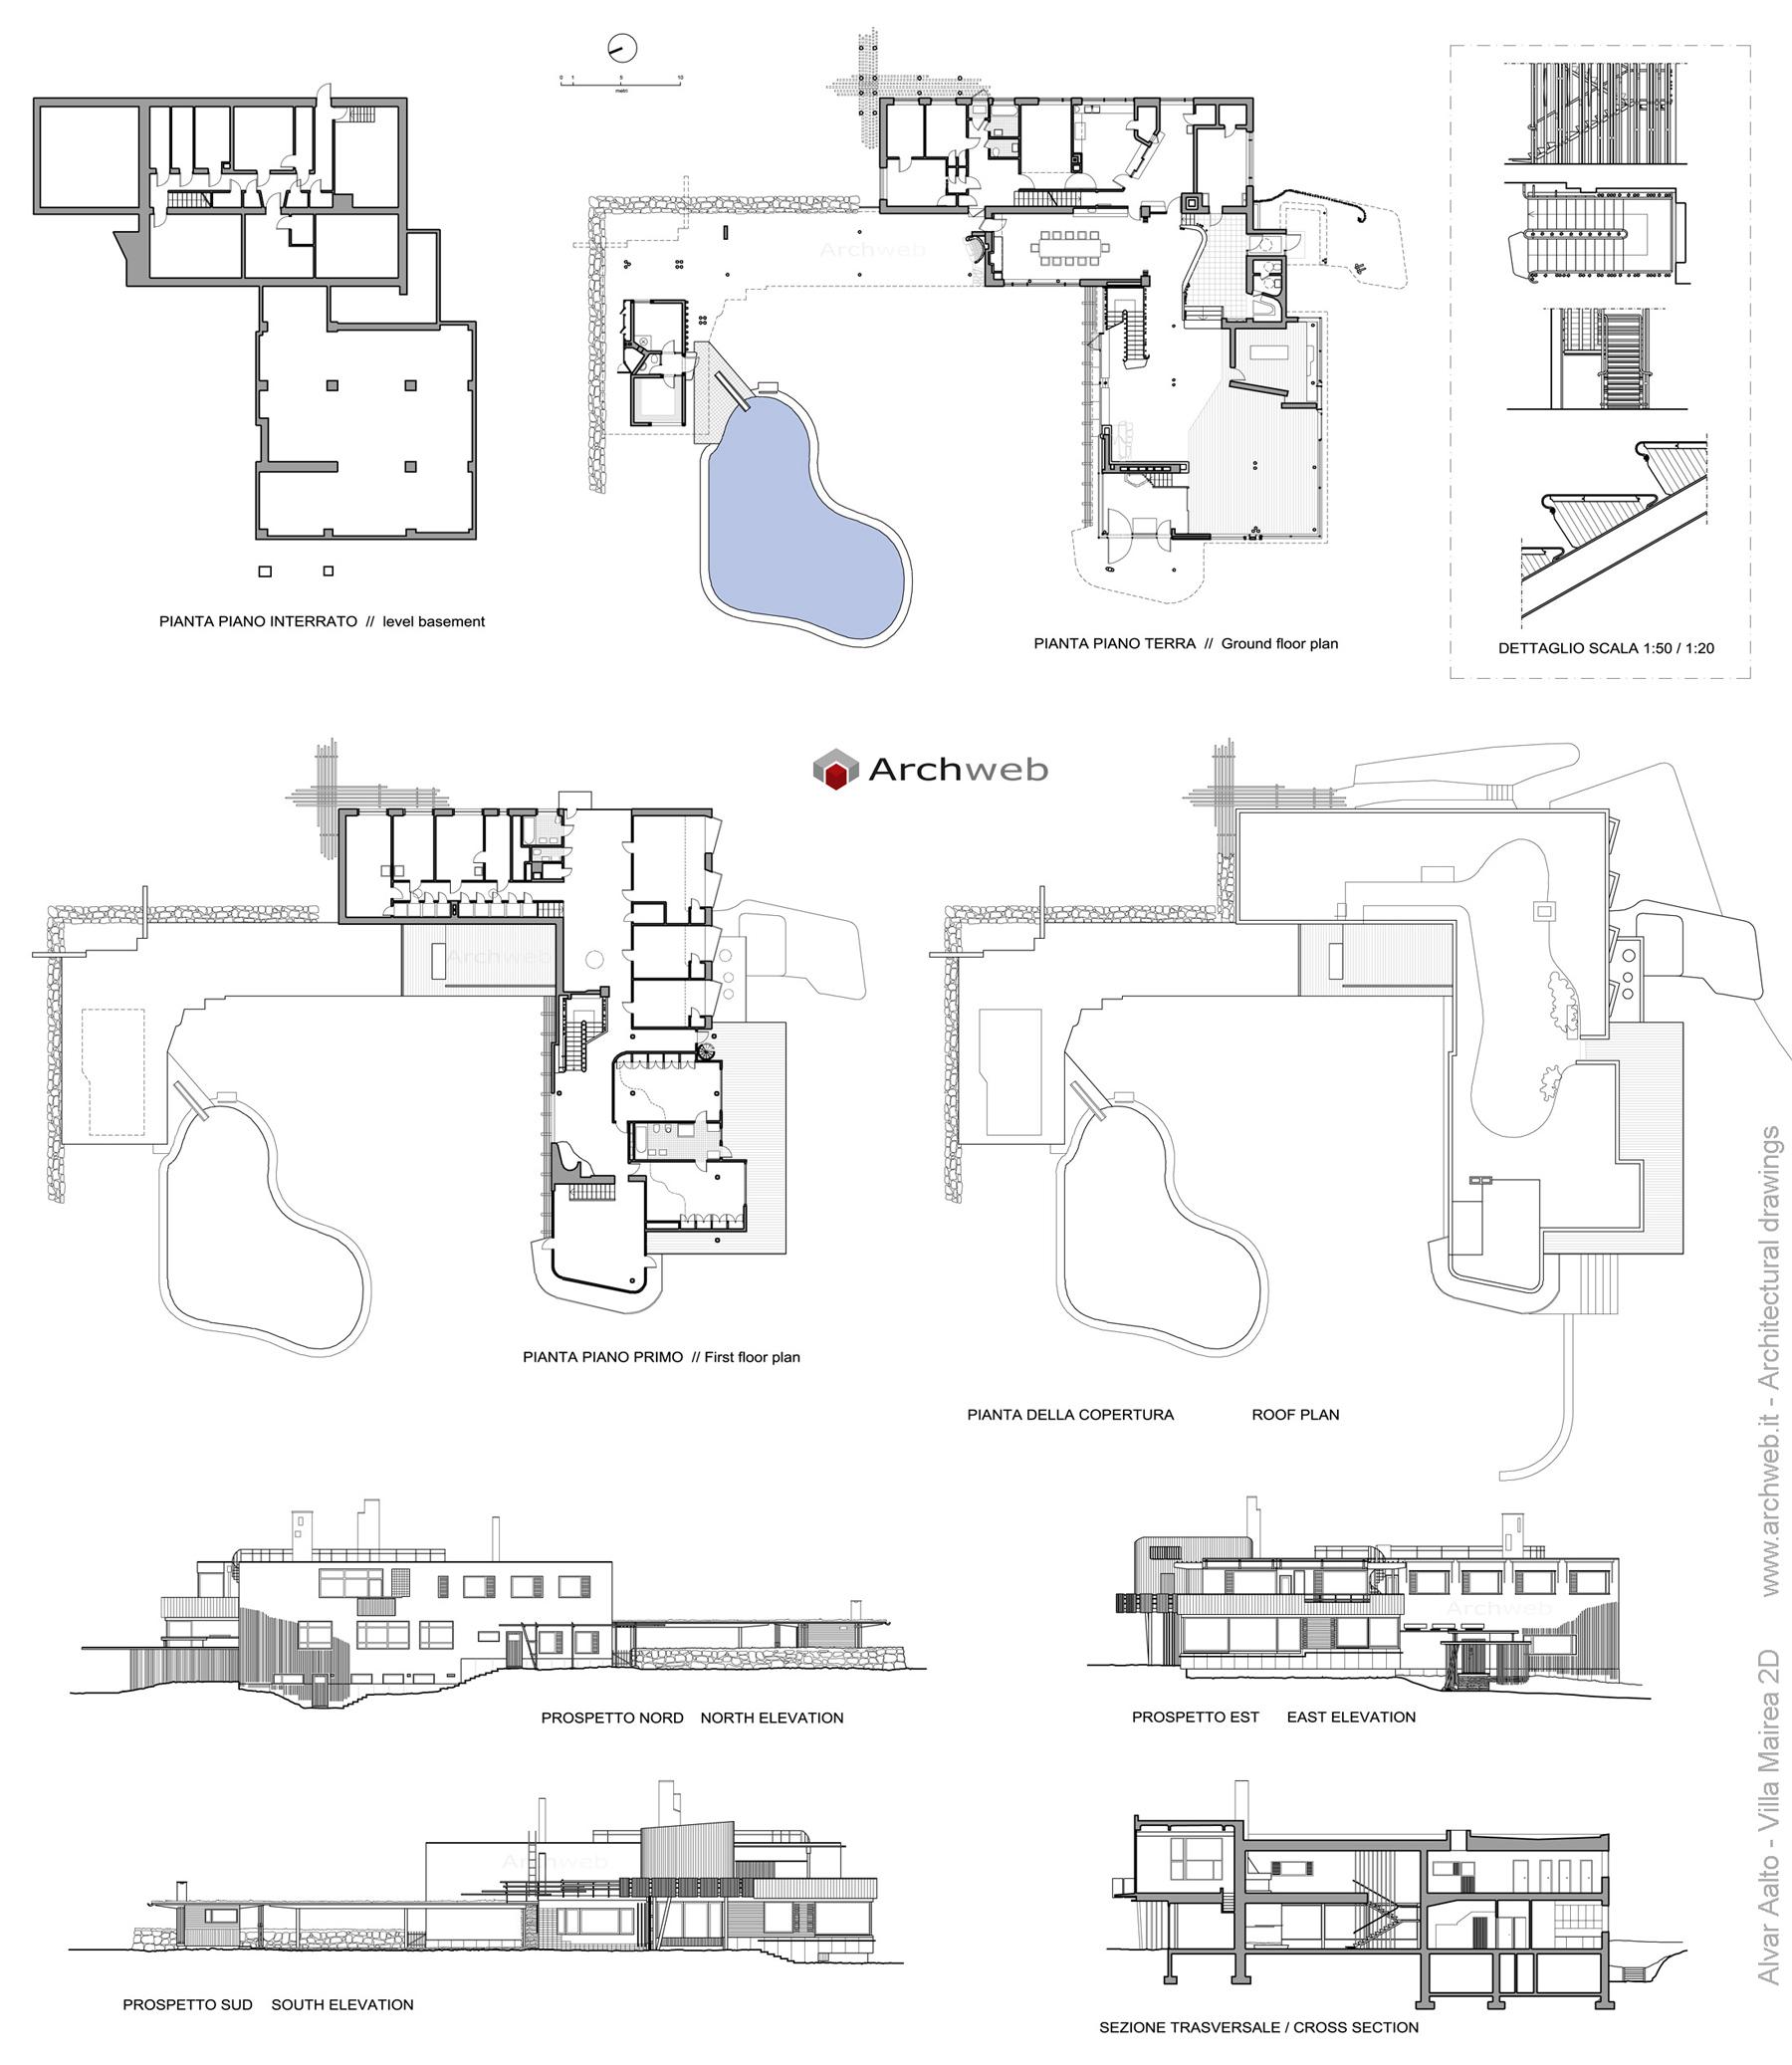 Villa Mairea Plan Drawings